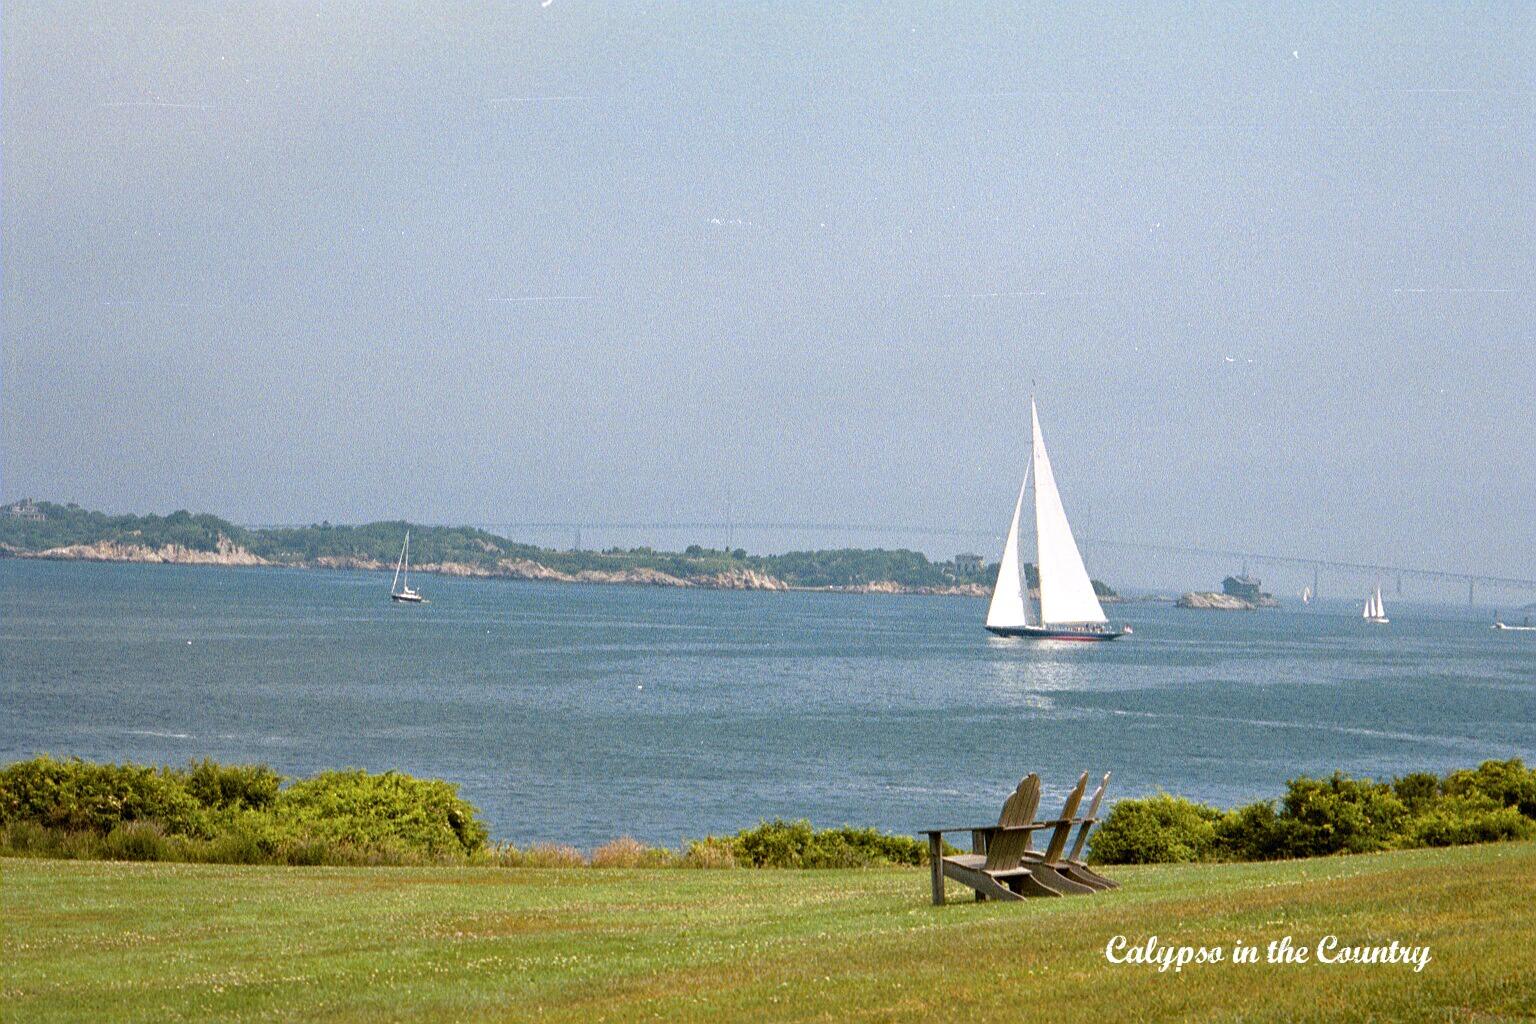 View from the Castle Hill Inn - Newport Rhode Island